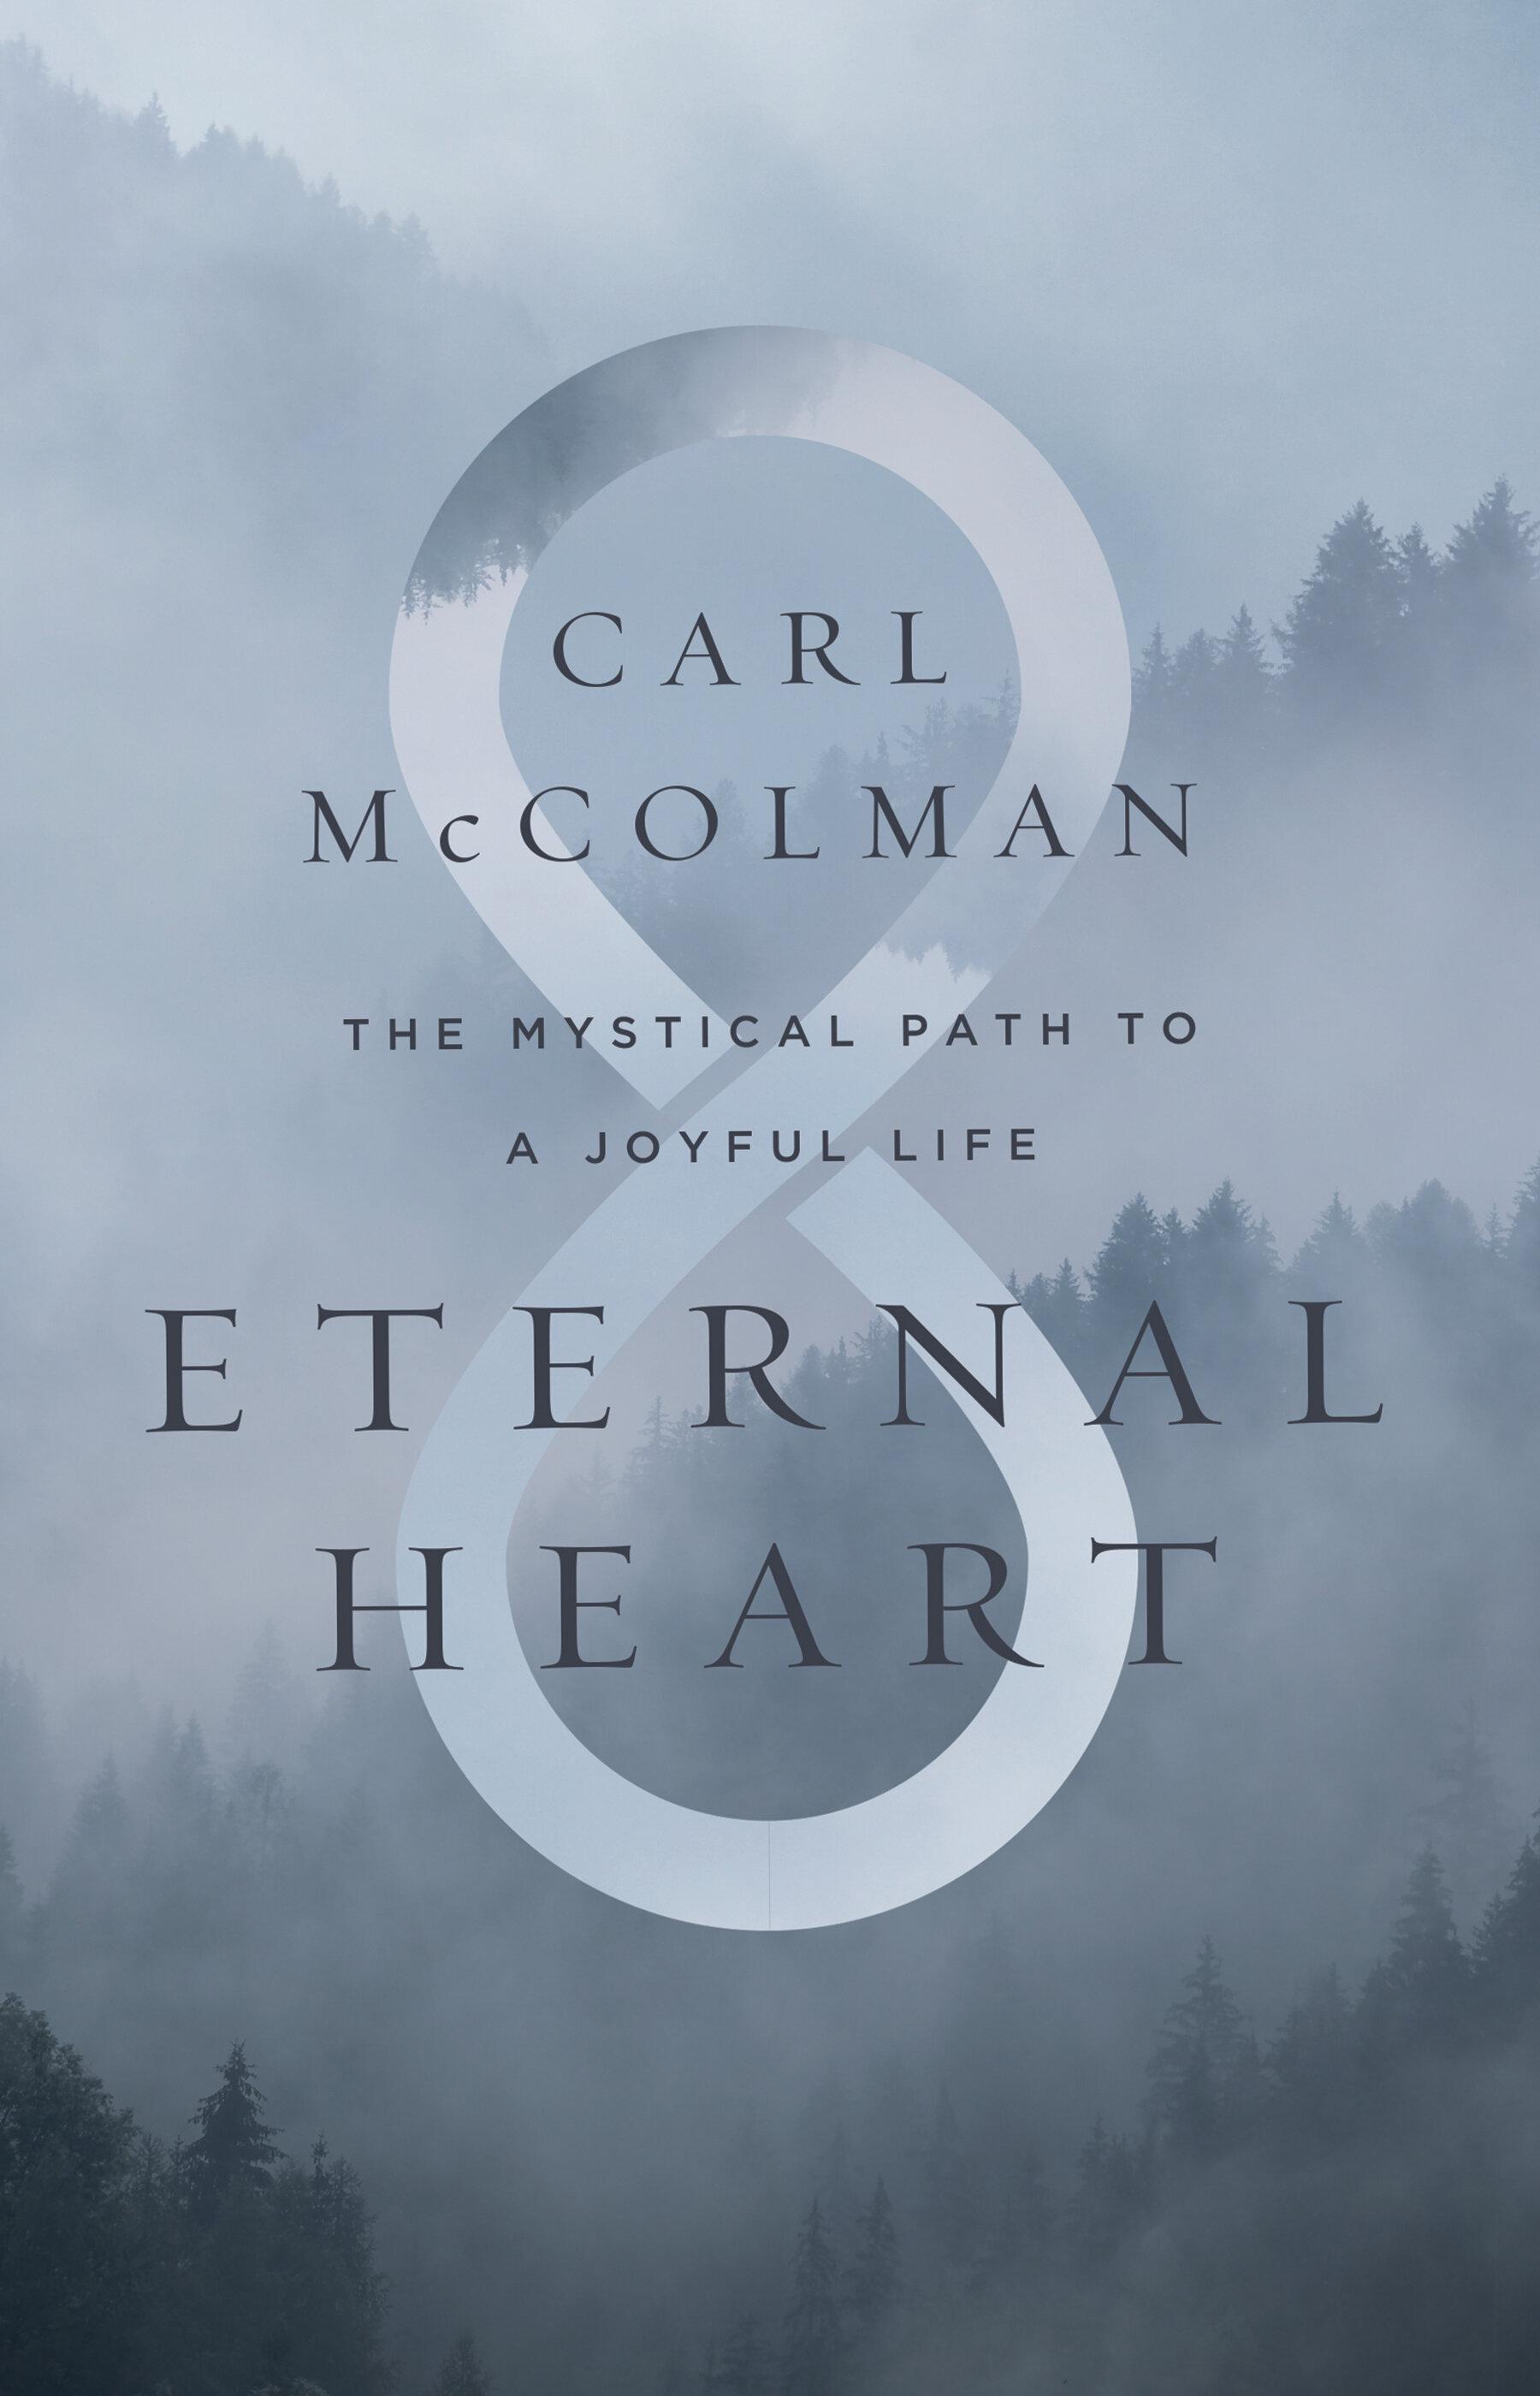 Eternal Heart: The Mystical Path to a Joyful Life